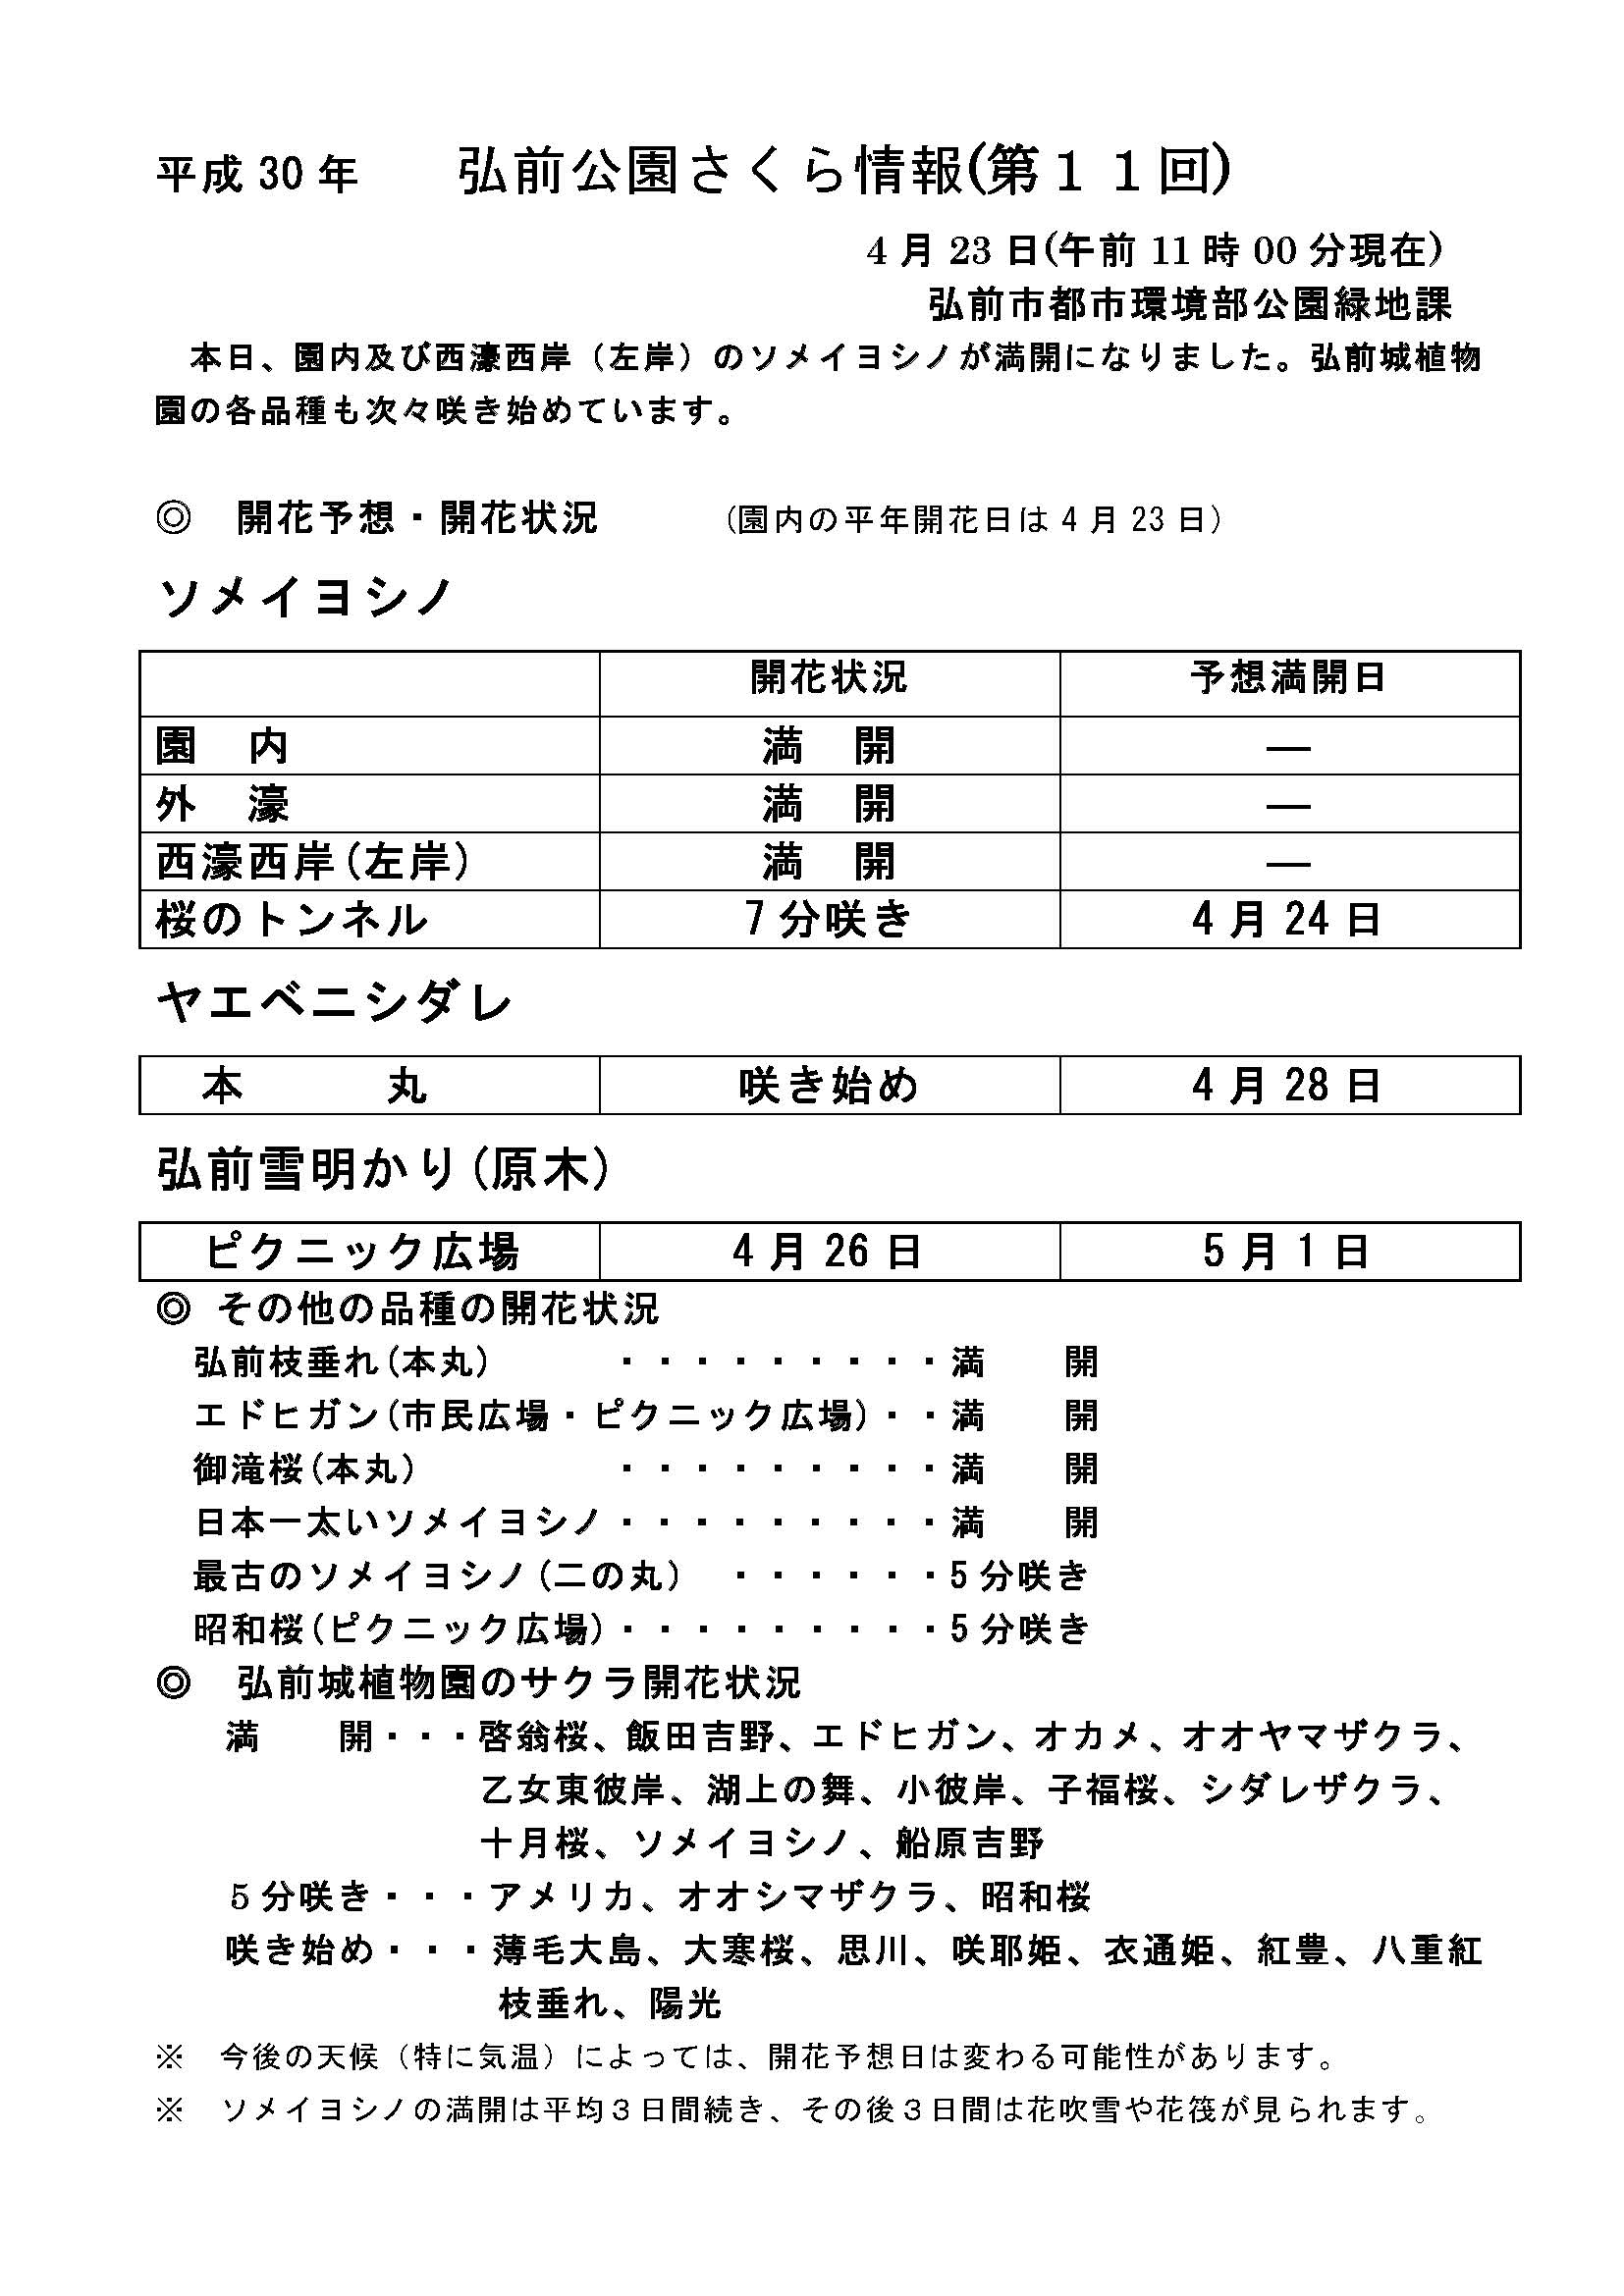 2018年4月23日付 弘前公園さくら情報(第10回)【弘前公園・弘前城】